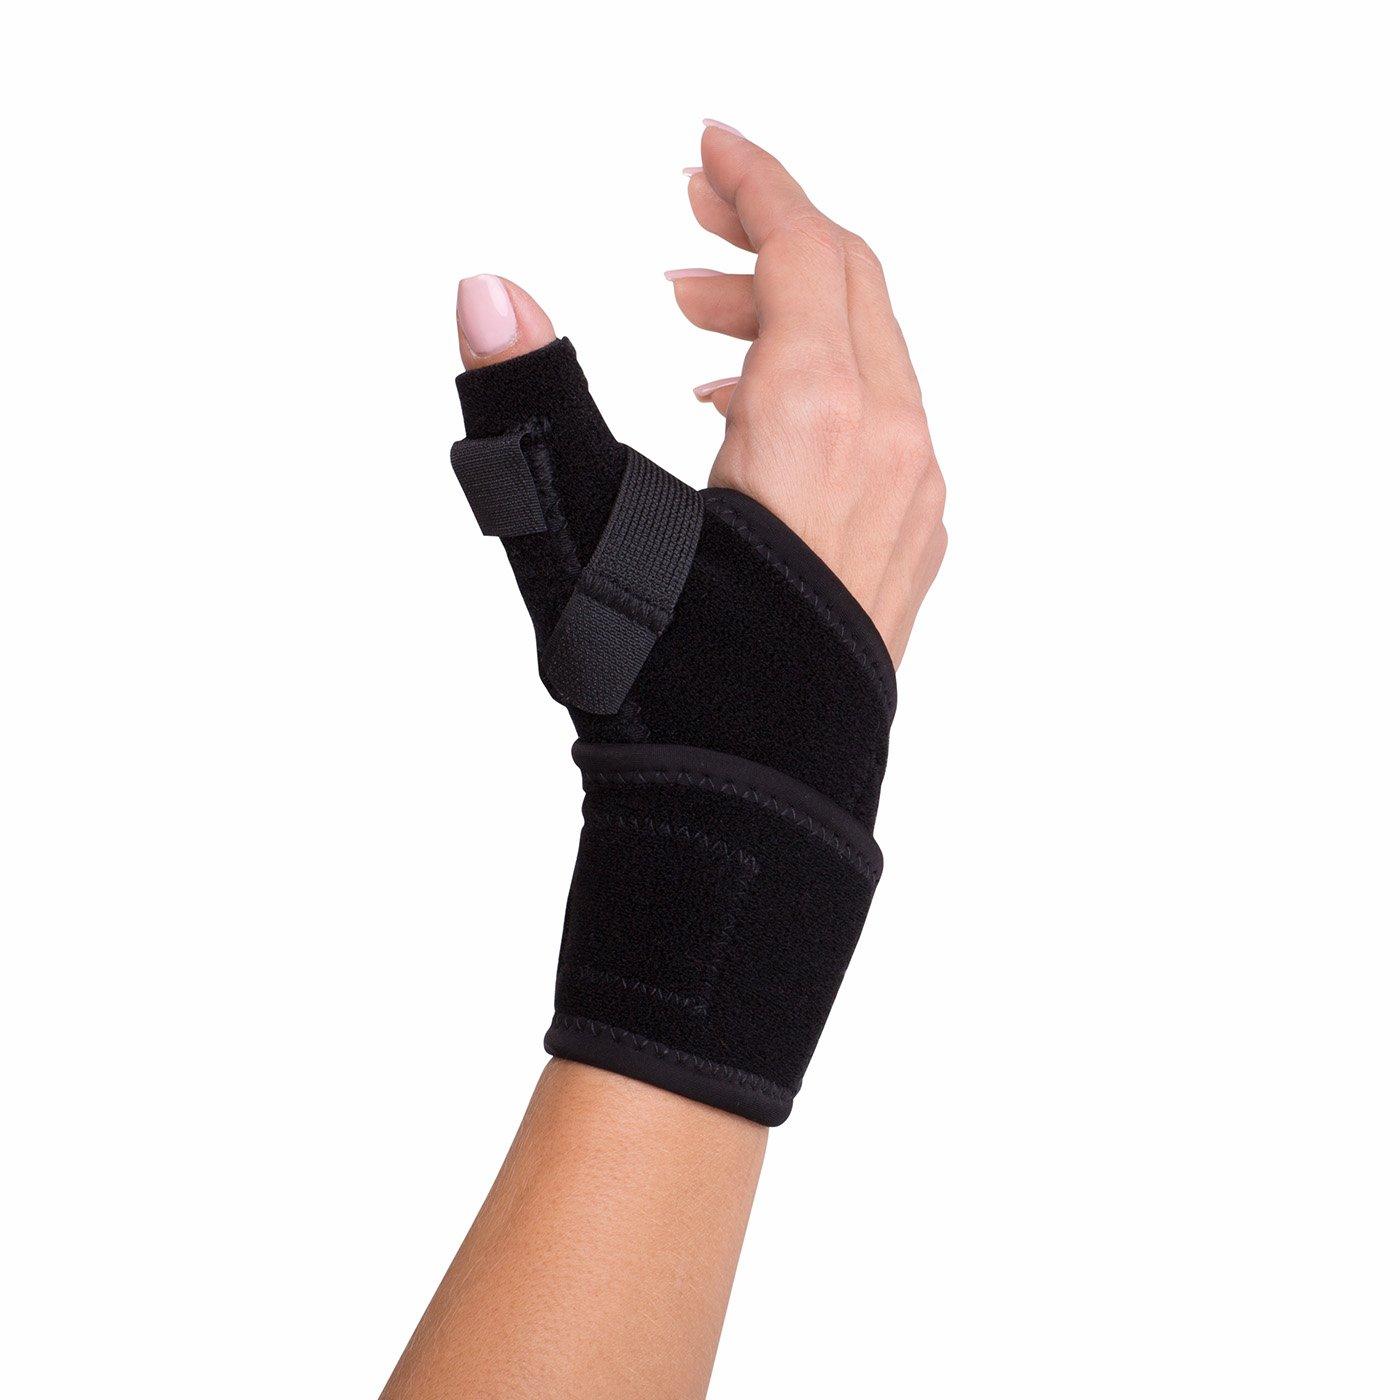 DonJoy Advantage DA161TB01-BLK Wrap Around Stabilizing Thumb Splint, Black, Adjustable, Fits 5.5'' to 9.5'', Best for Tendonitis, Arthritis, Instability by DonJoy Advantage (Image #1)